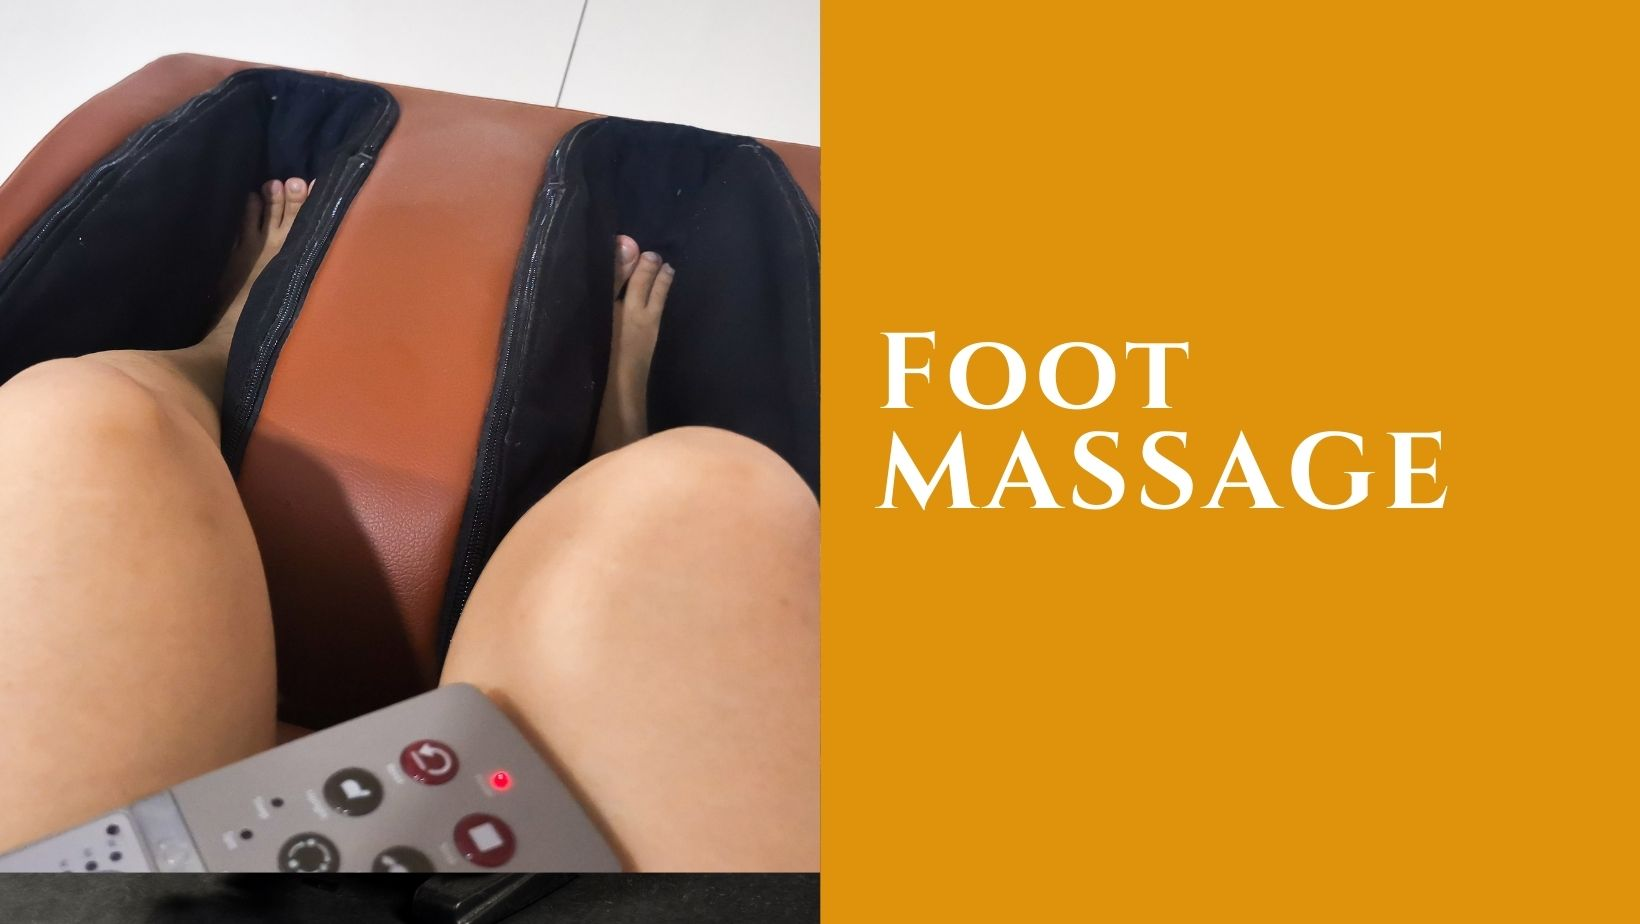 Solid Massage equipment - foot massage